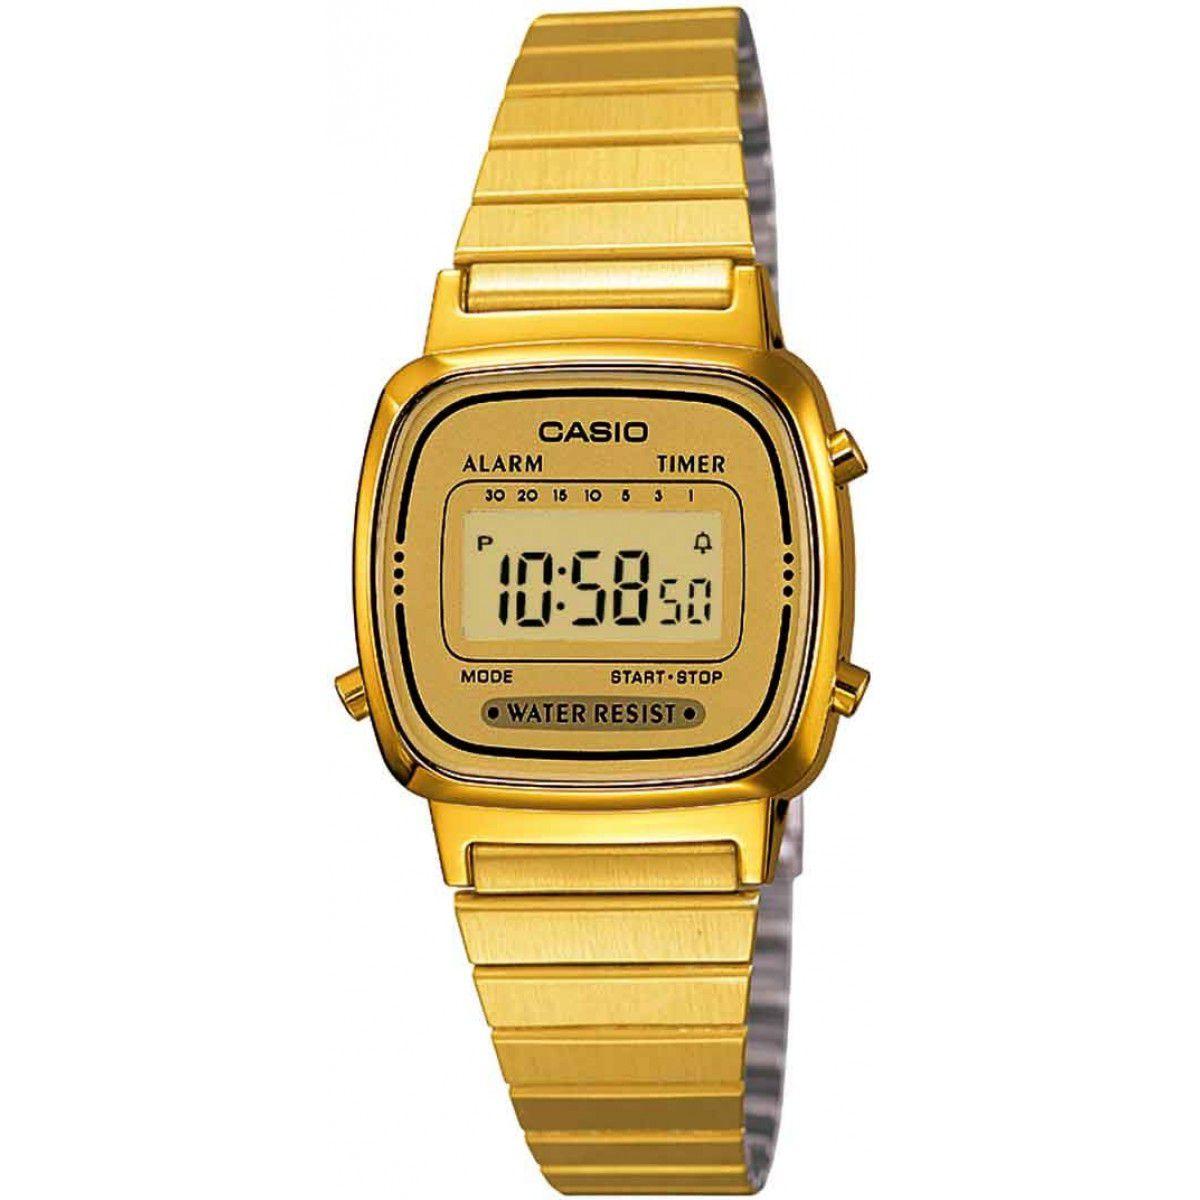 Relógio Casio Vintage Dourado